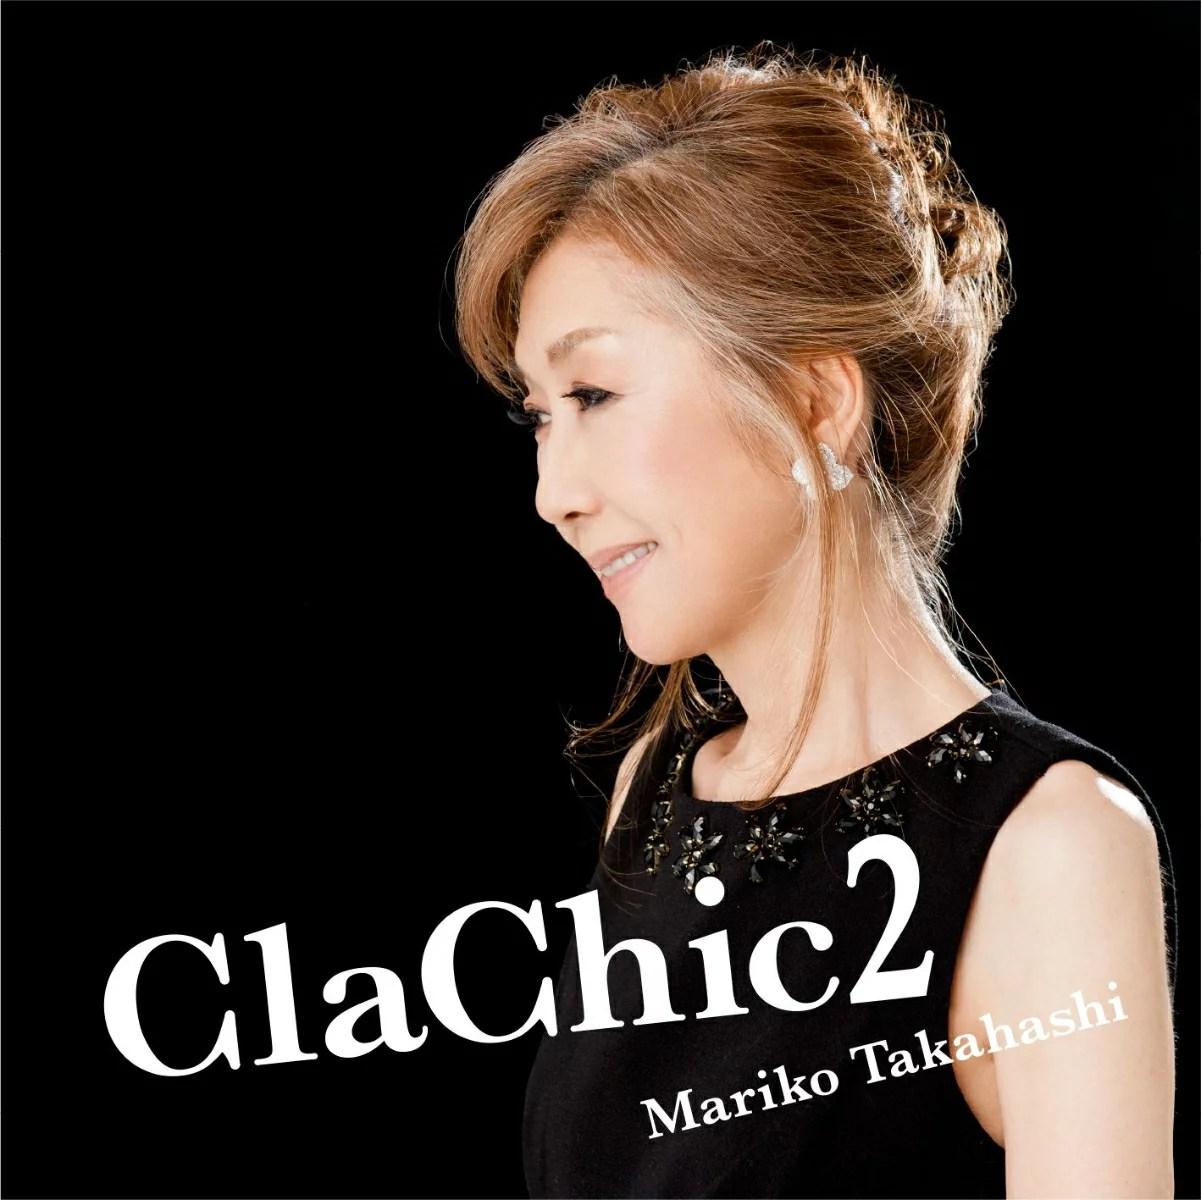 ClaChic 2 -ヒトハダ ℃- (期間限定盤 CD+DVD) [ 高橋真梨子 ] - 楽天ブックス